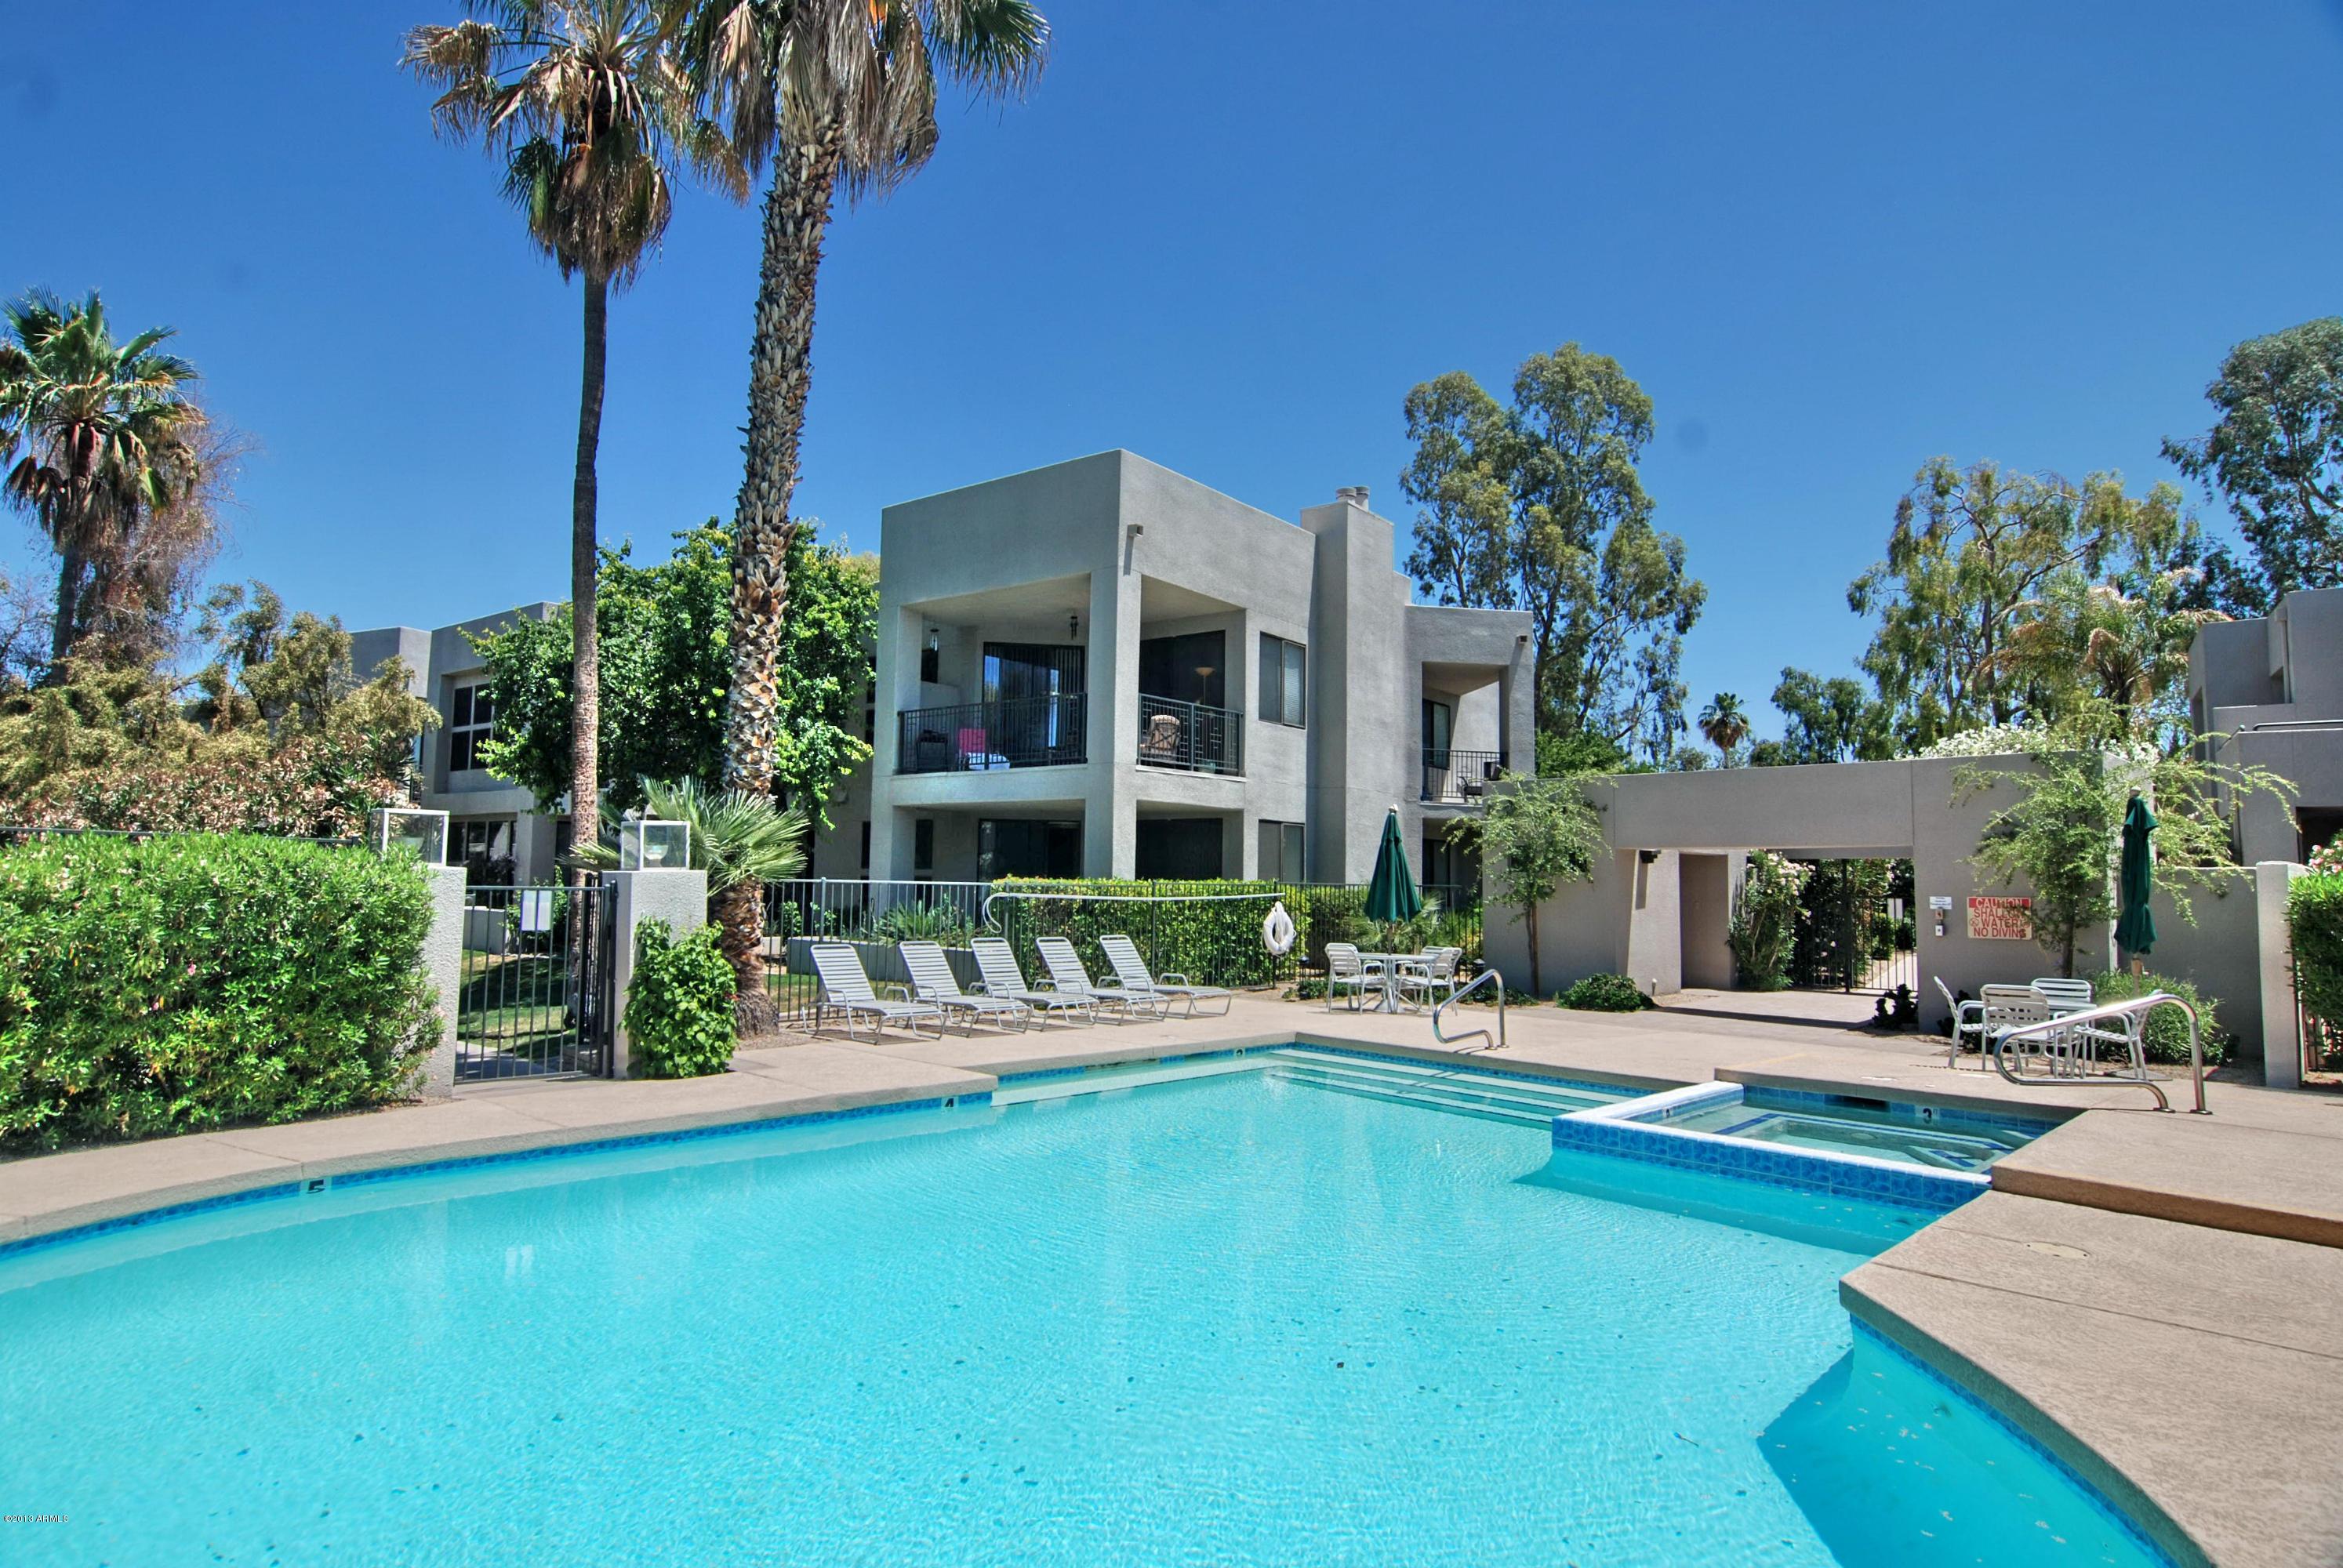 Photo of 7700 E GAINEY RANCH Road #115, Scottsdale, AZ 85258